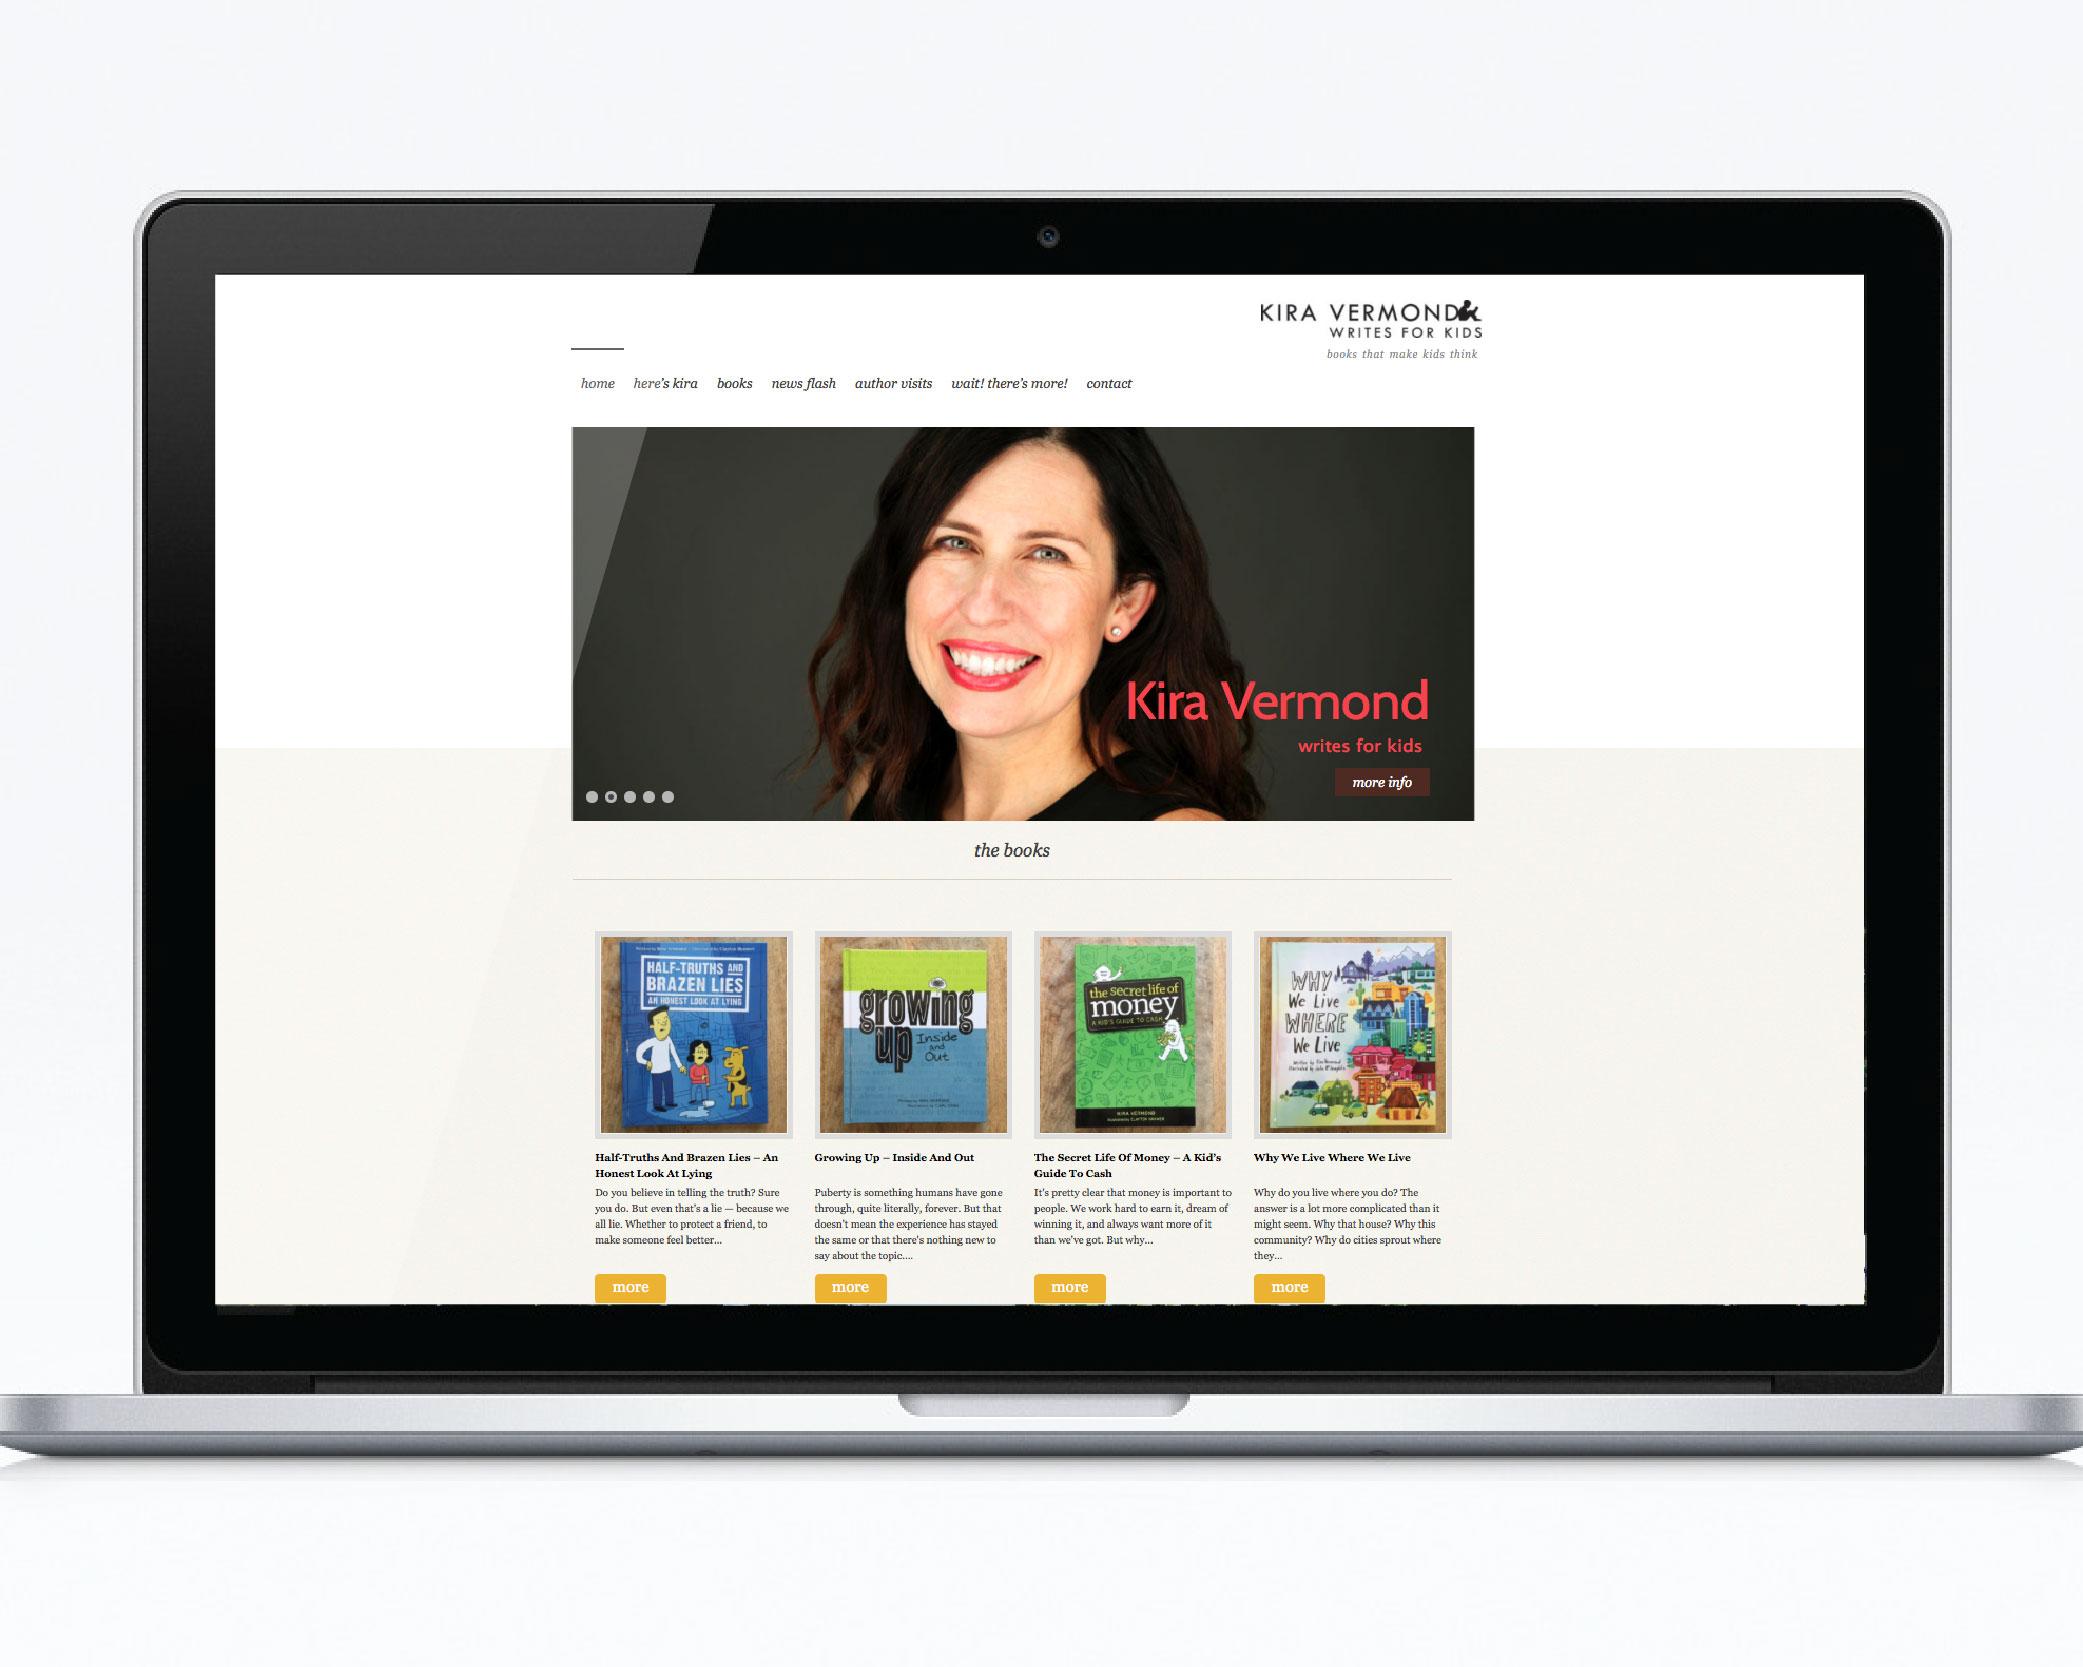 Kira Vermond site